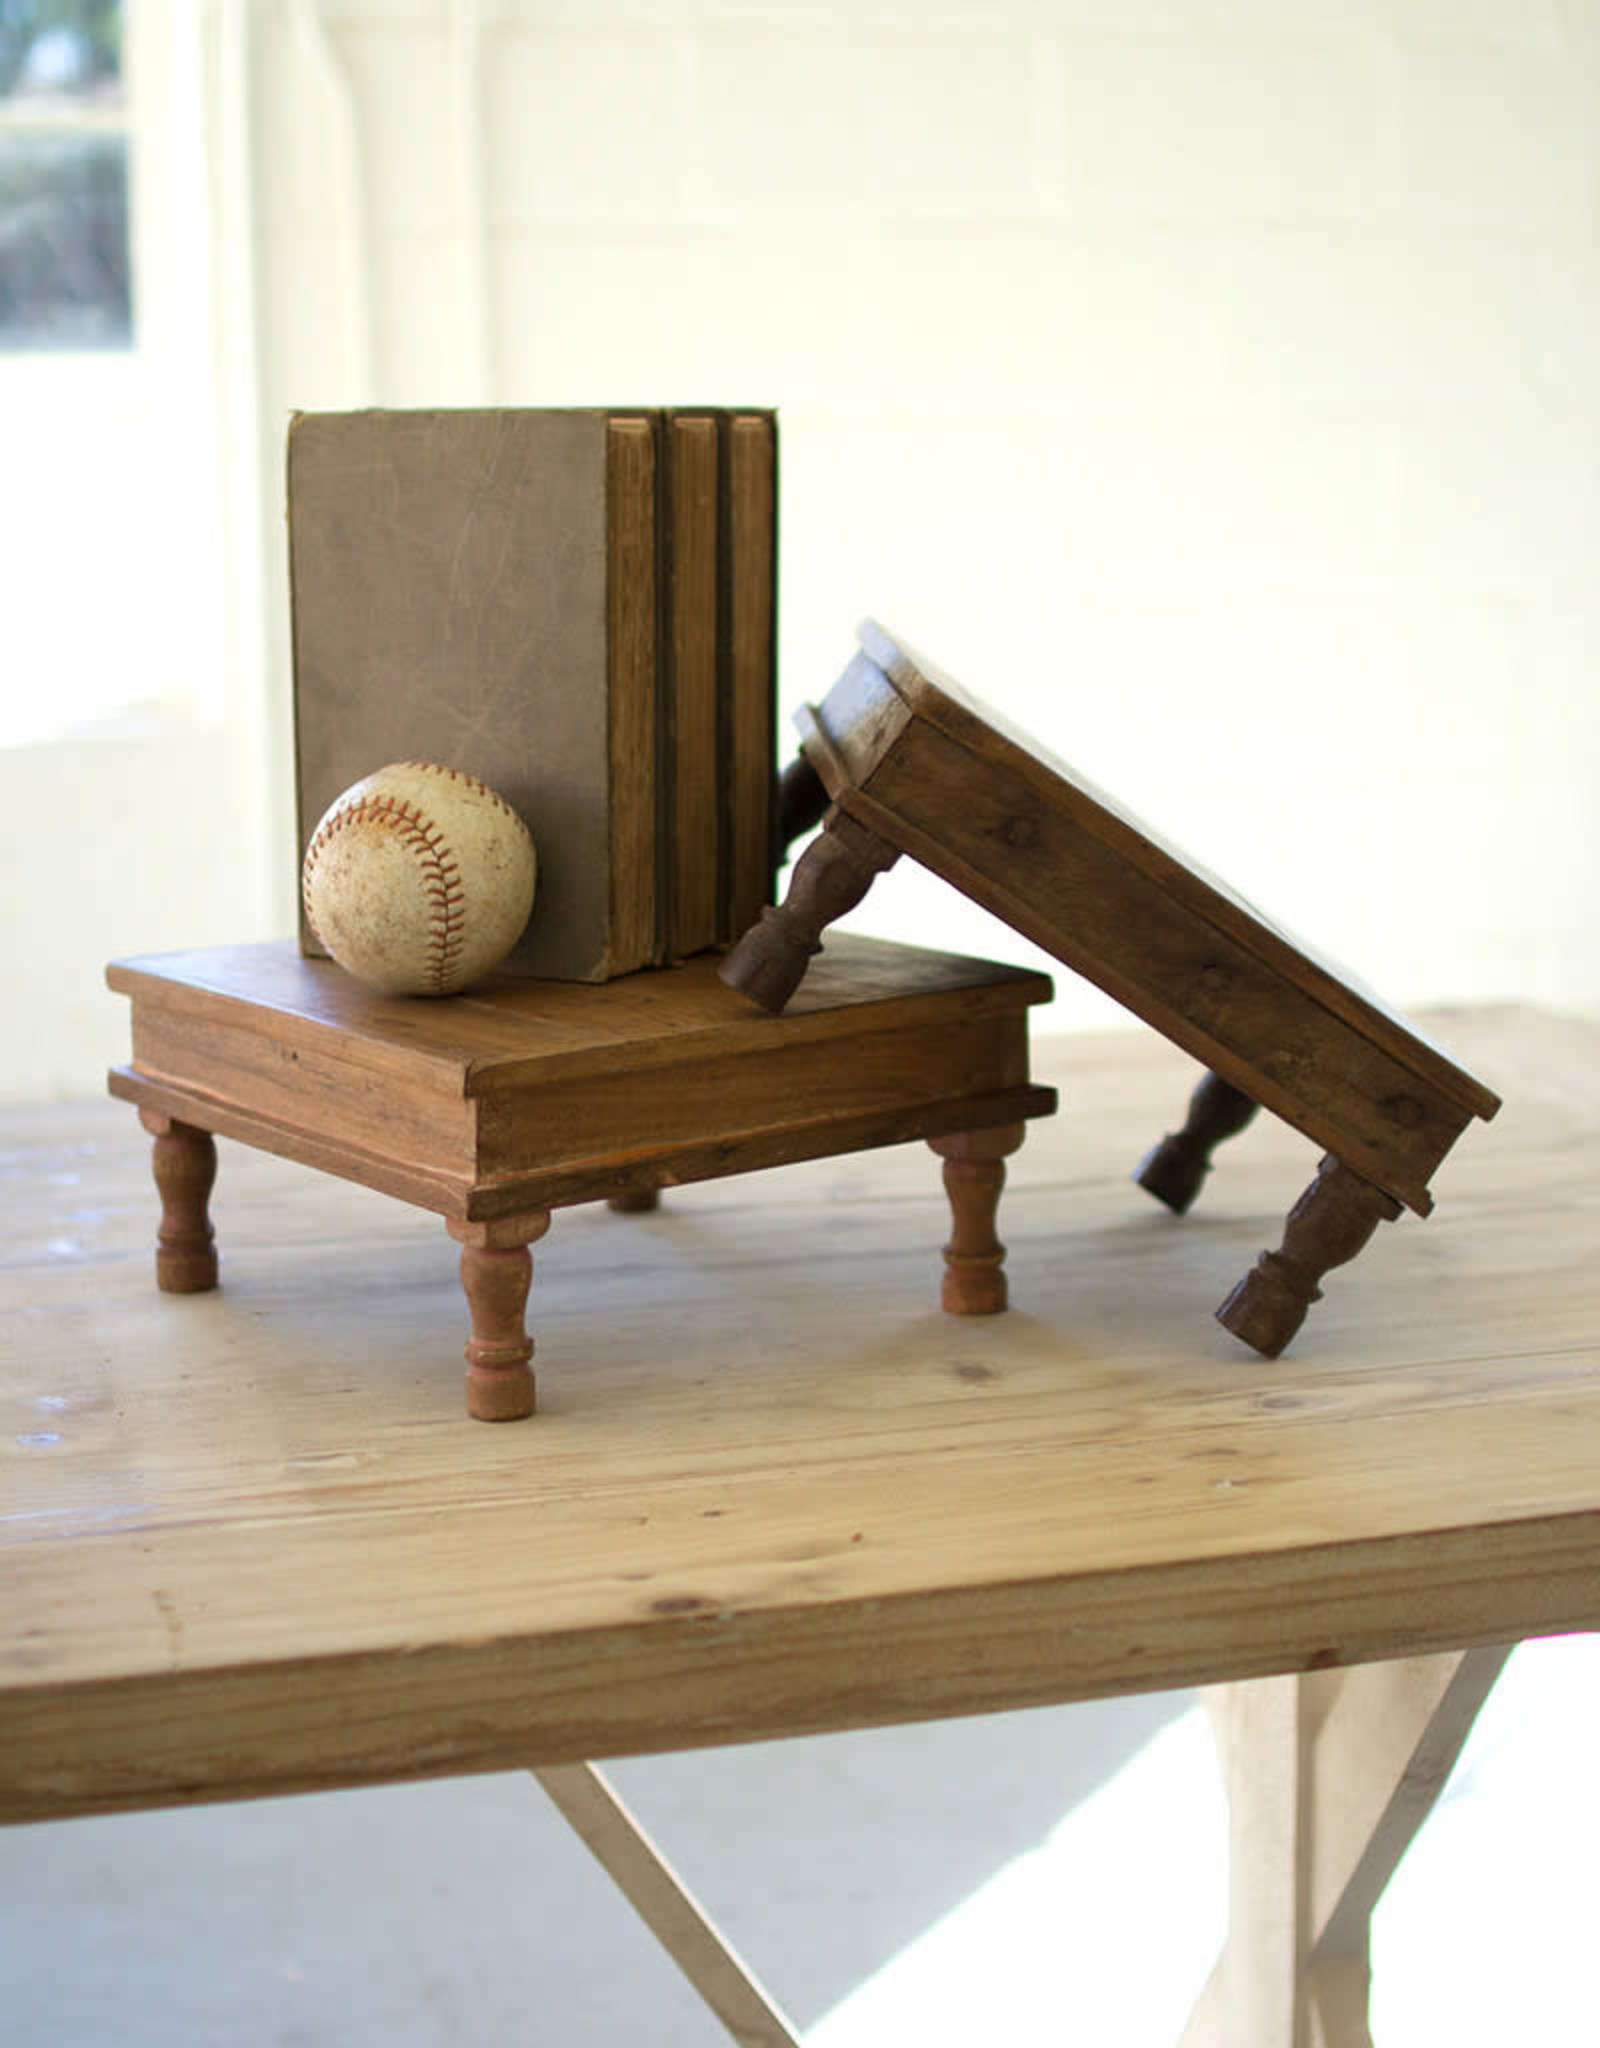 Kalalou Small Recycled Wooden Riser